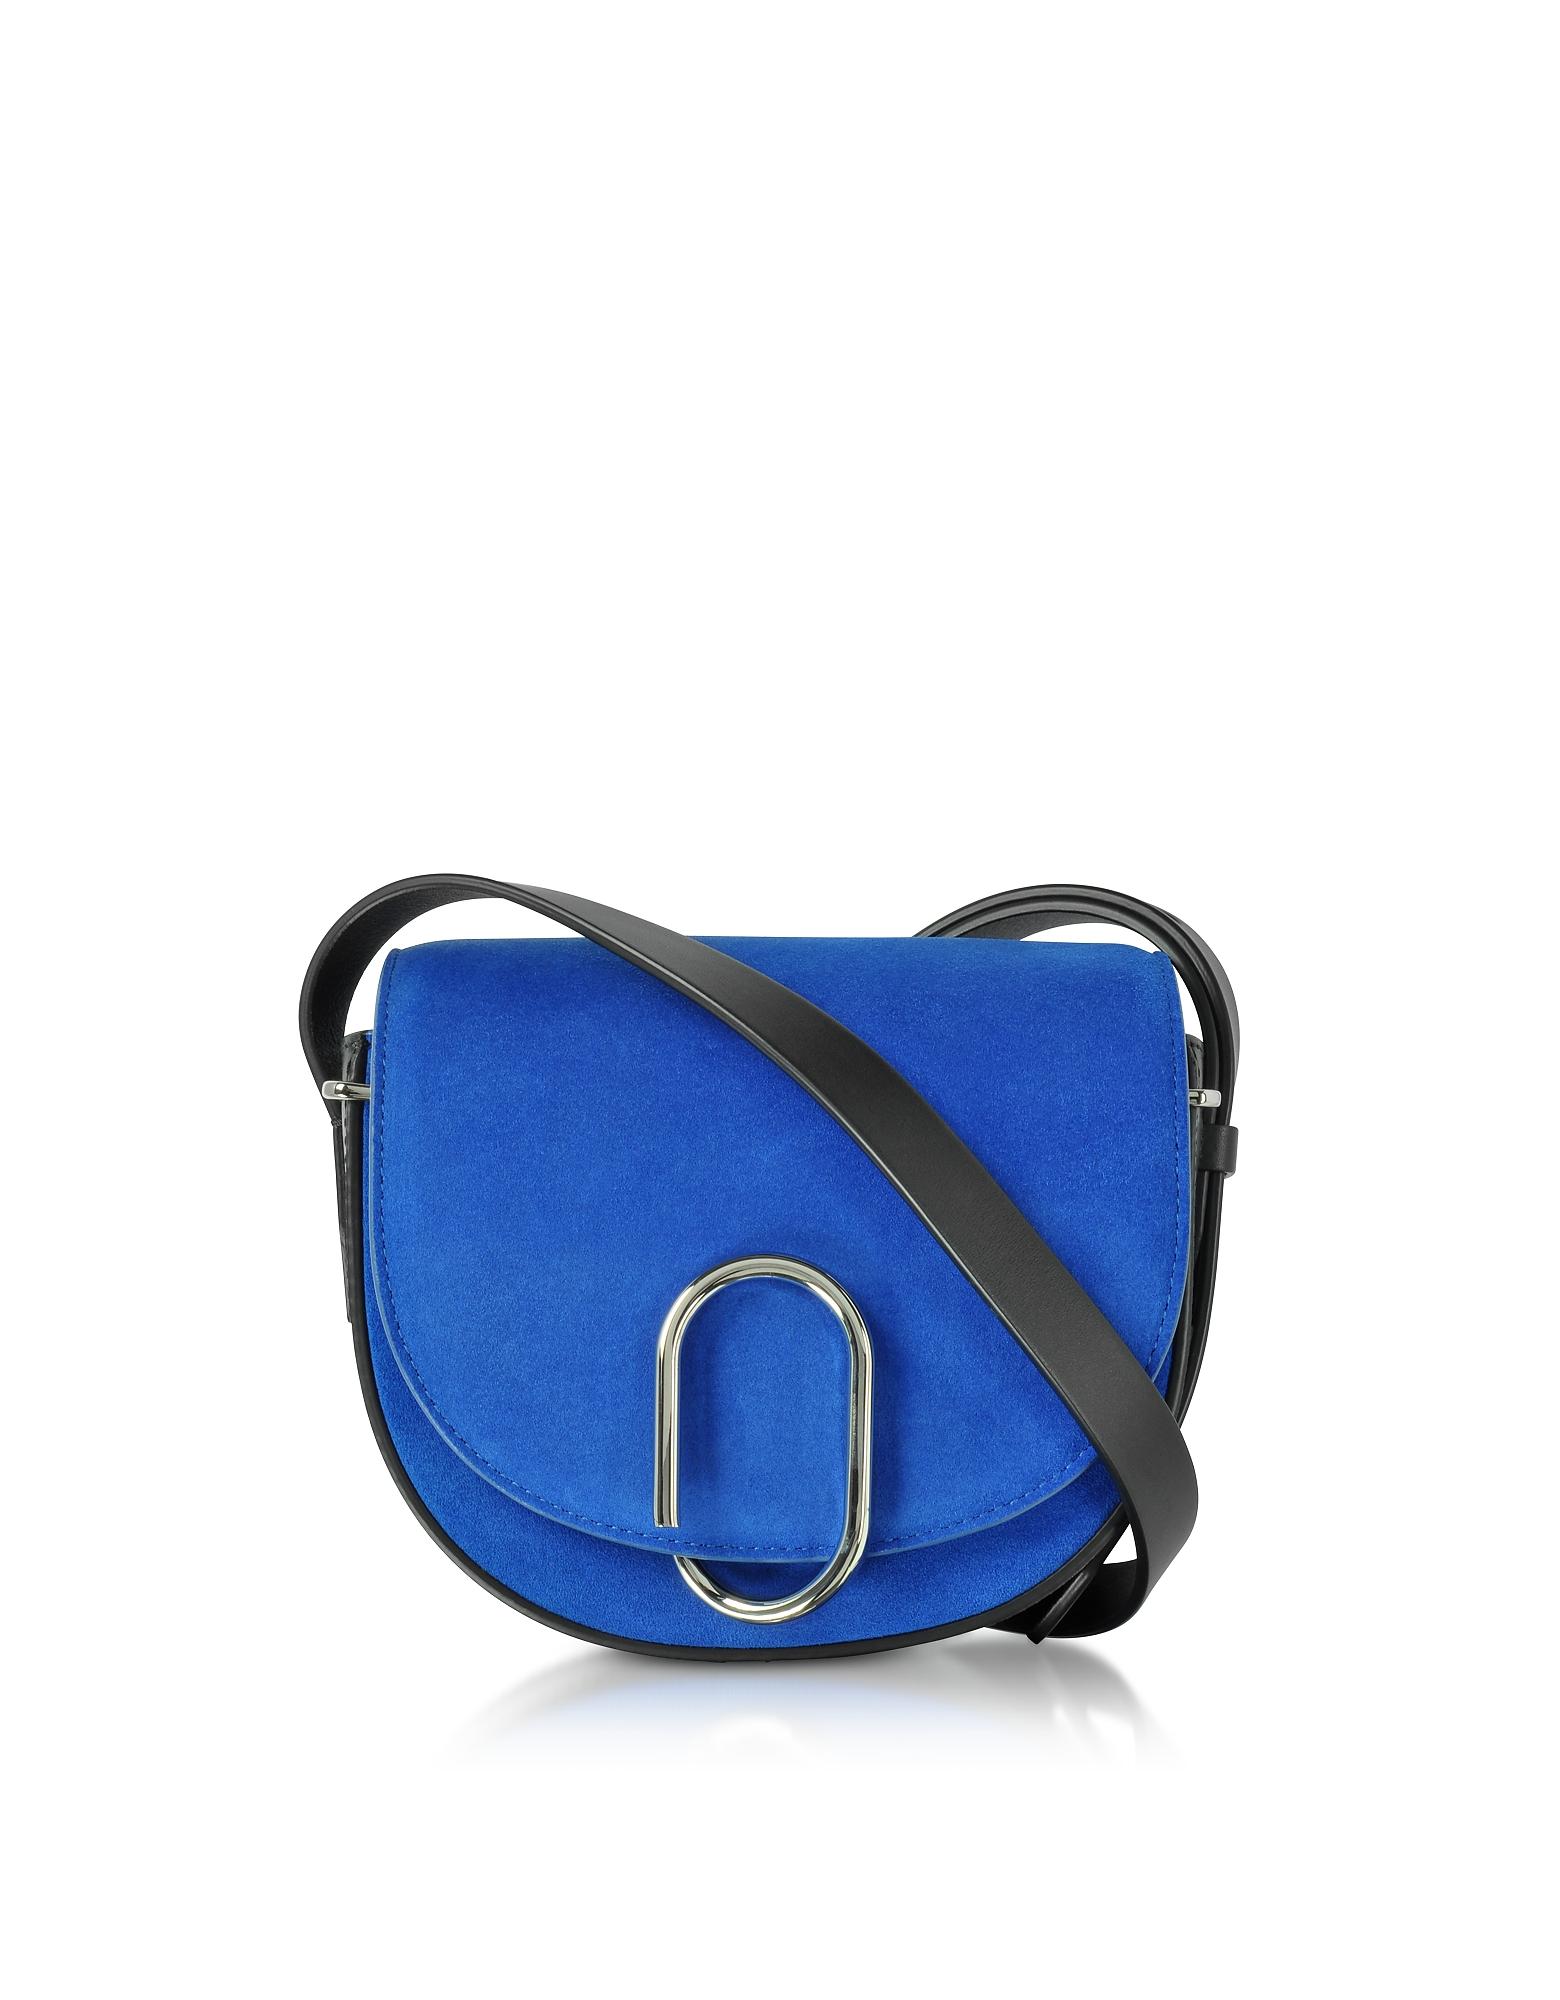 3.1 Phillip Lim Handbags, Electric Blue Suede Alix Mini Saddle Bag